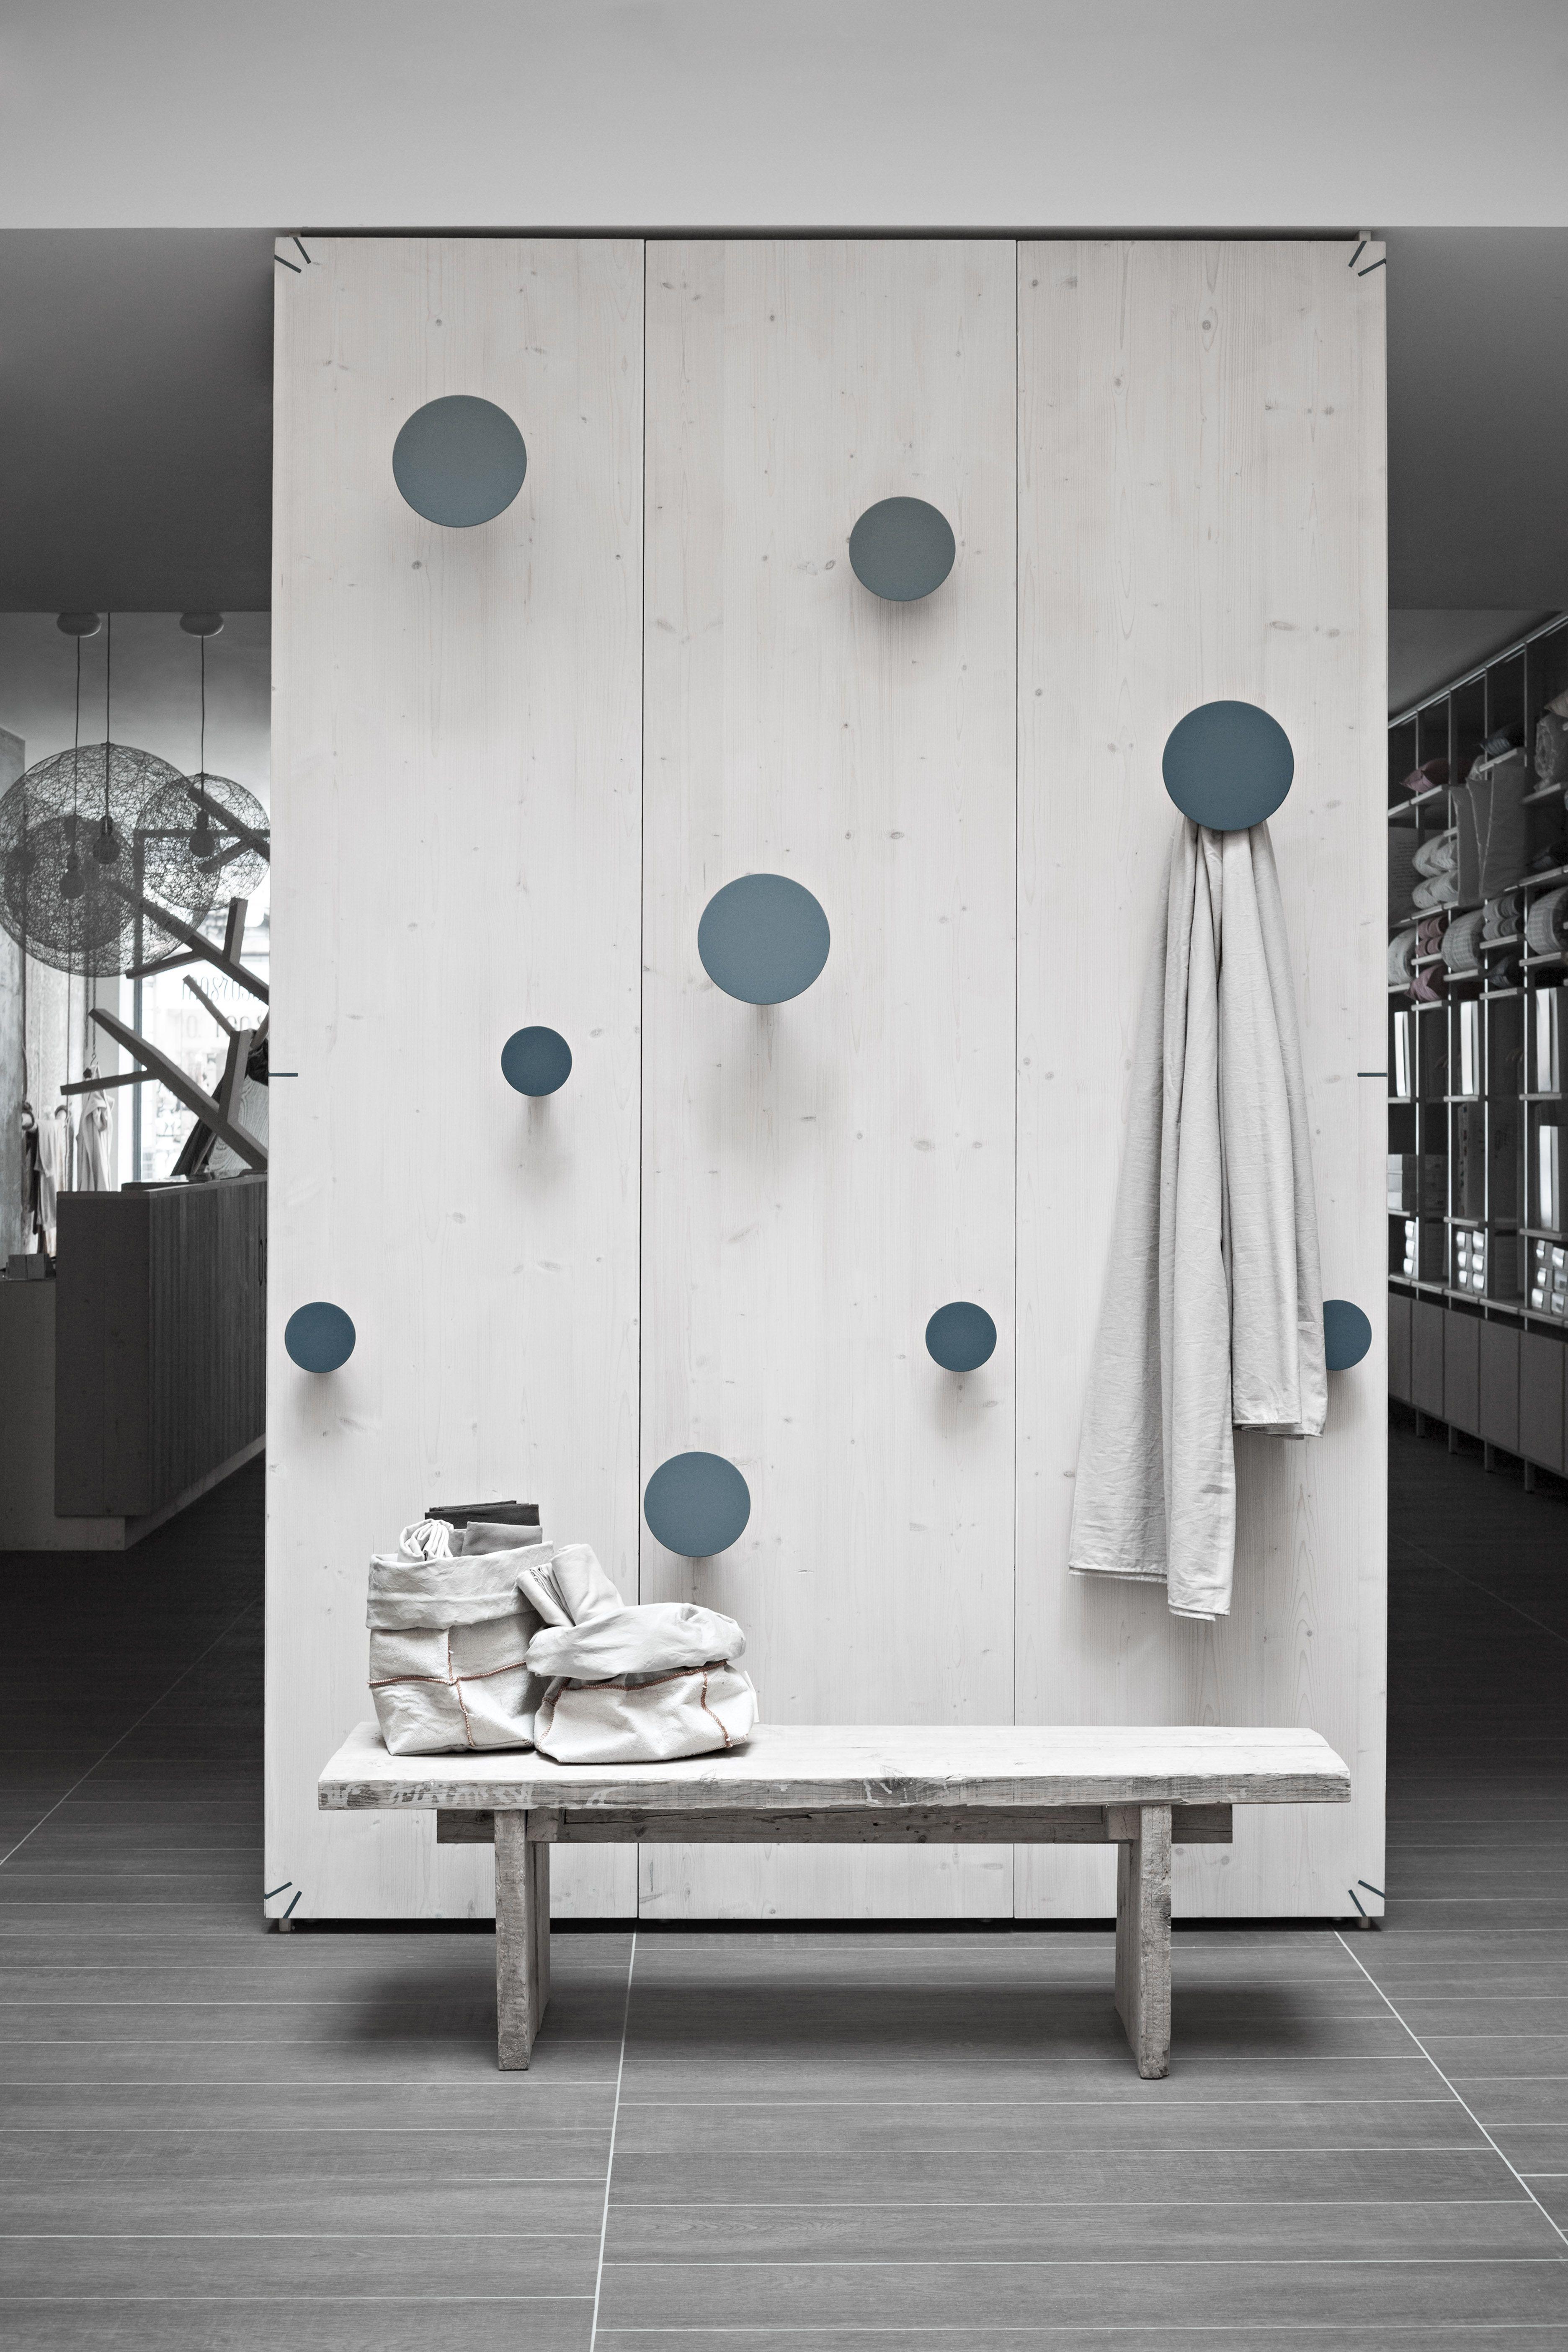 L formte küche design ideen styling alessandra salaris   retail  pinterest  interiors